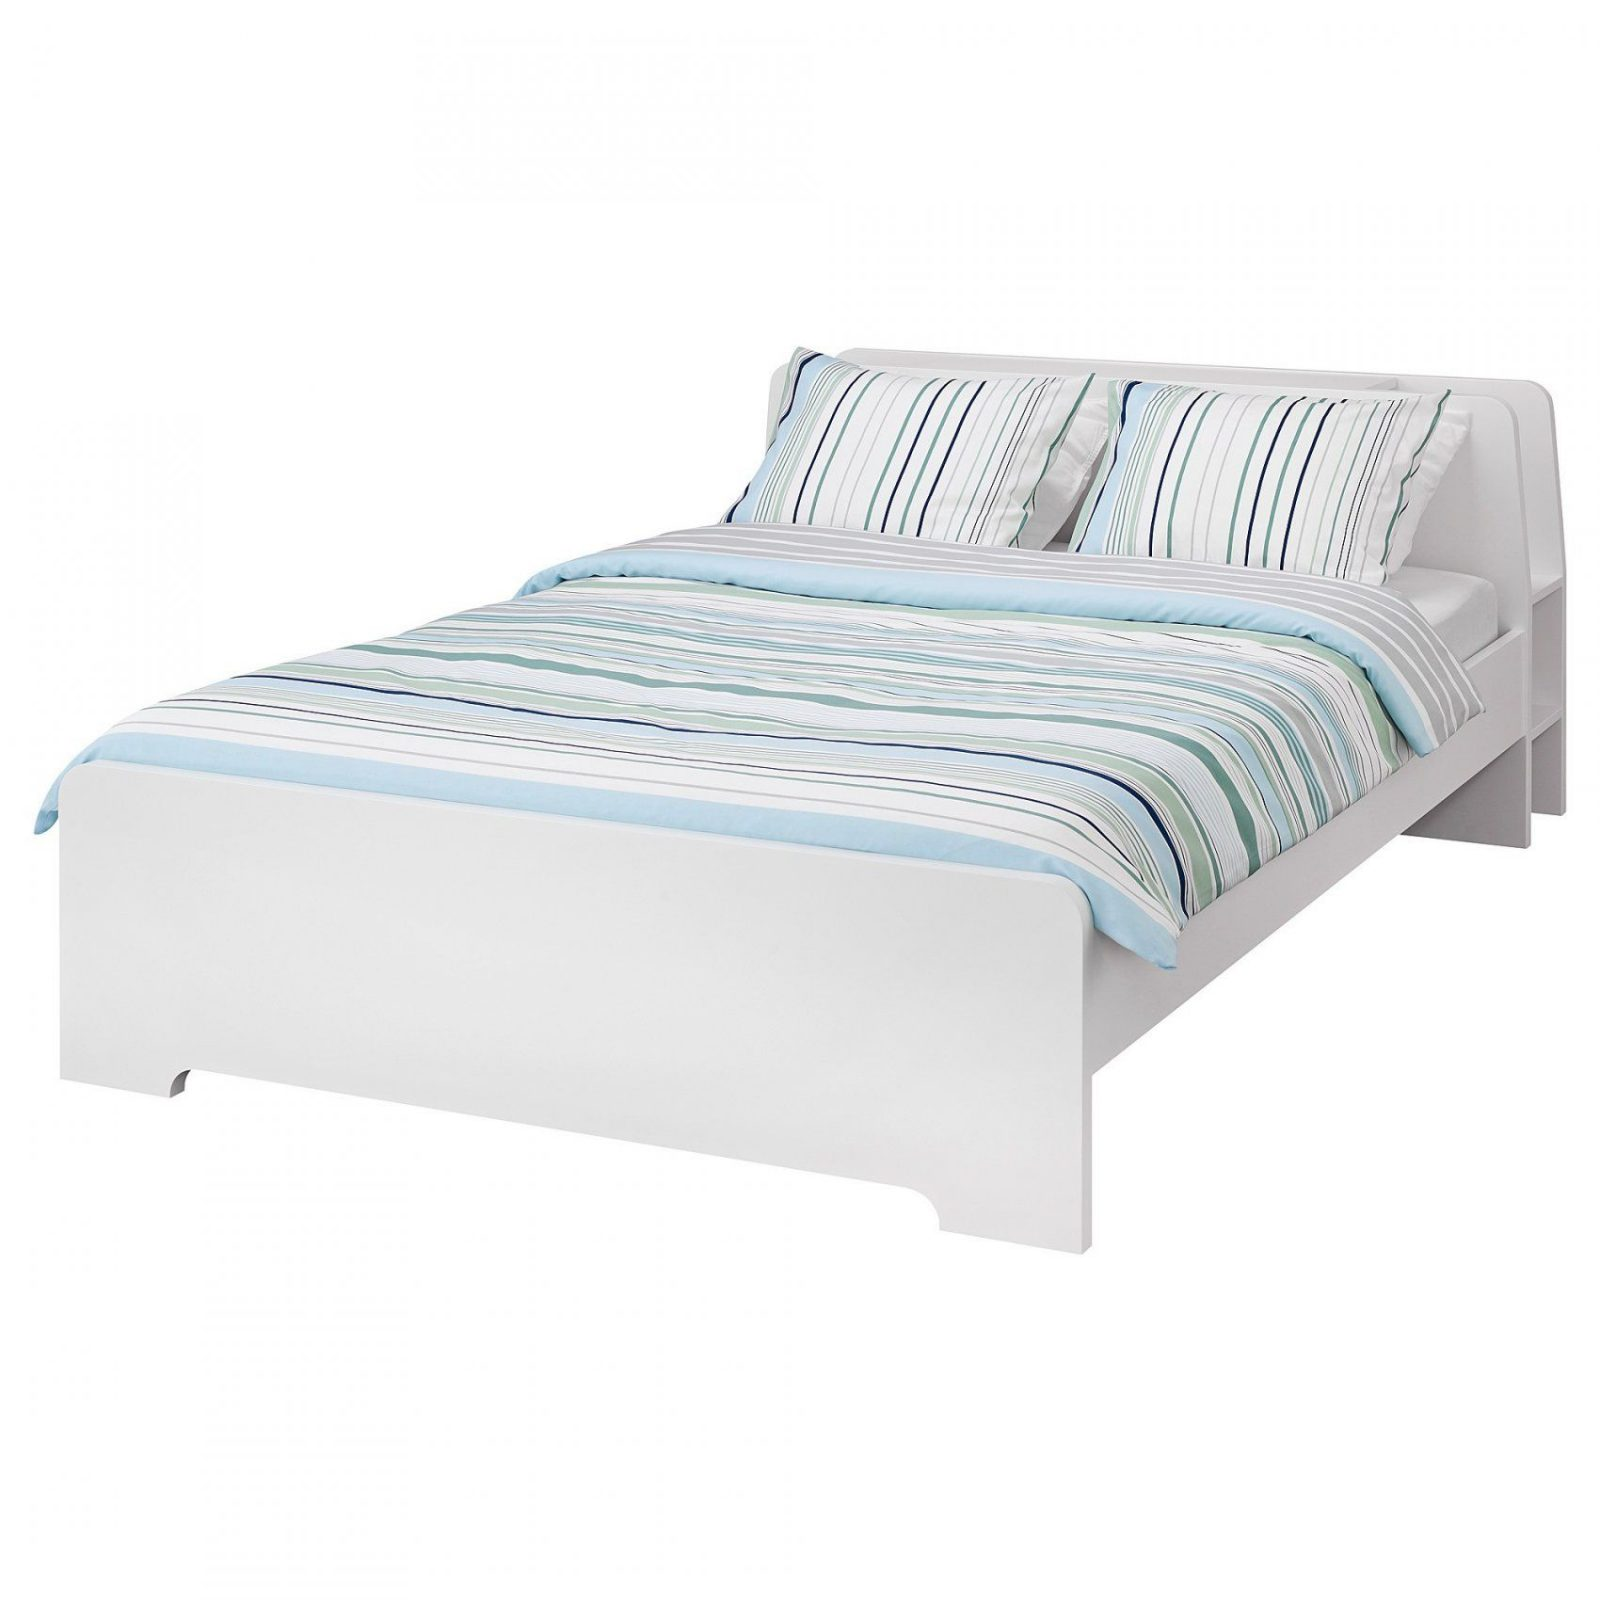 Malm Bettgestell Hoch  160X200 Cm  Weiß  Ikea von Ikea Malm Bett 160X200 Birke Bild